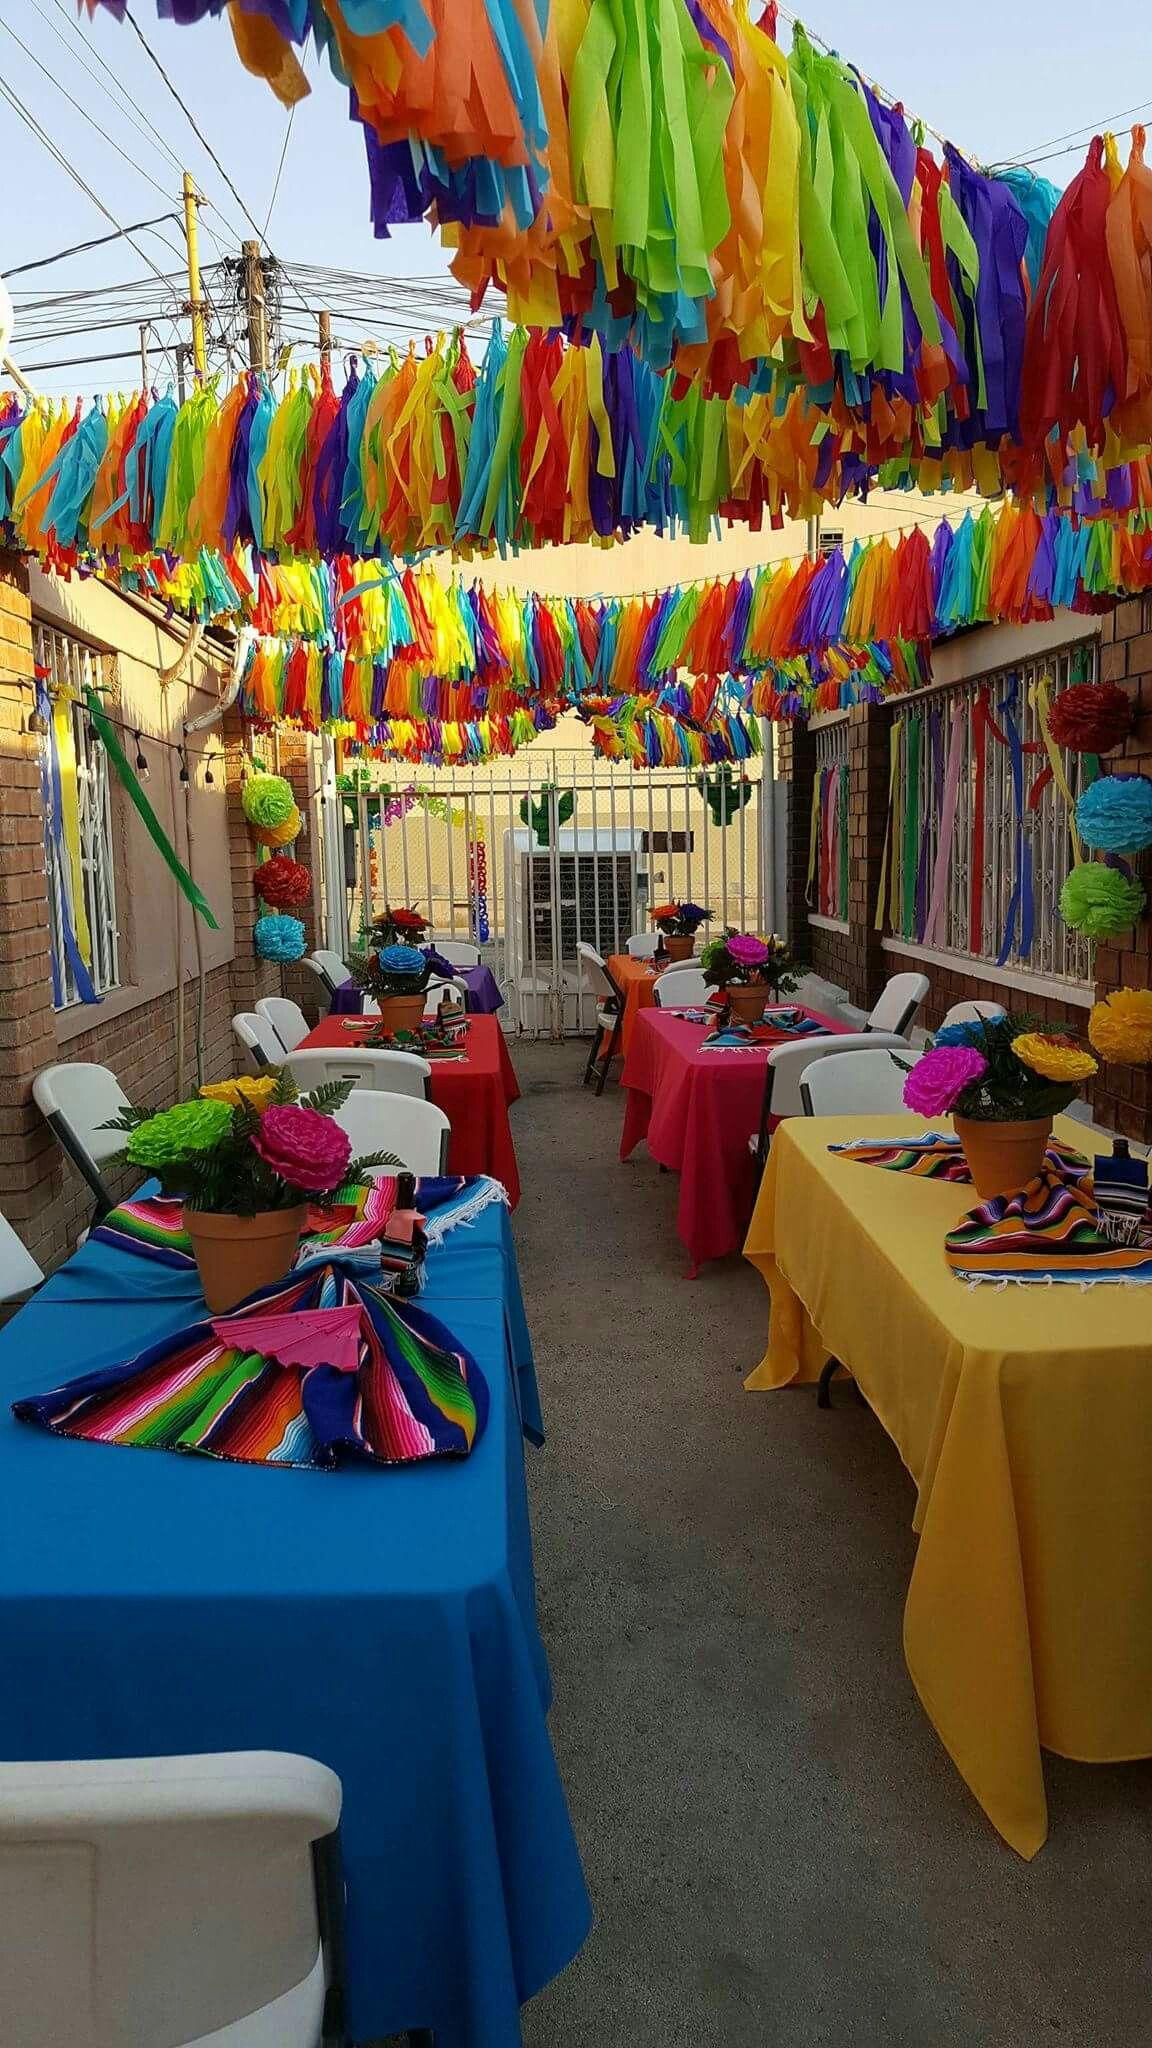 Decoraci n mexicana frida kahlo frida kahlo pi ata - Ideas para decoracion ...